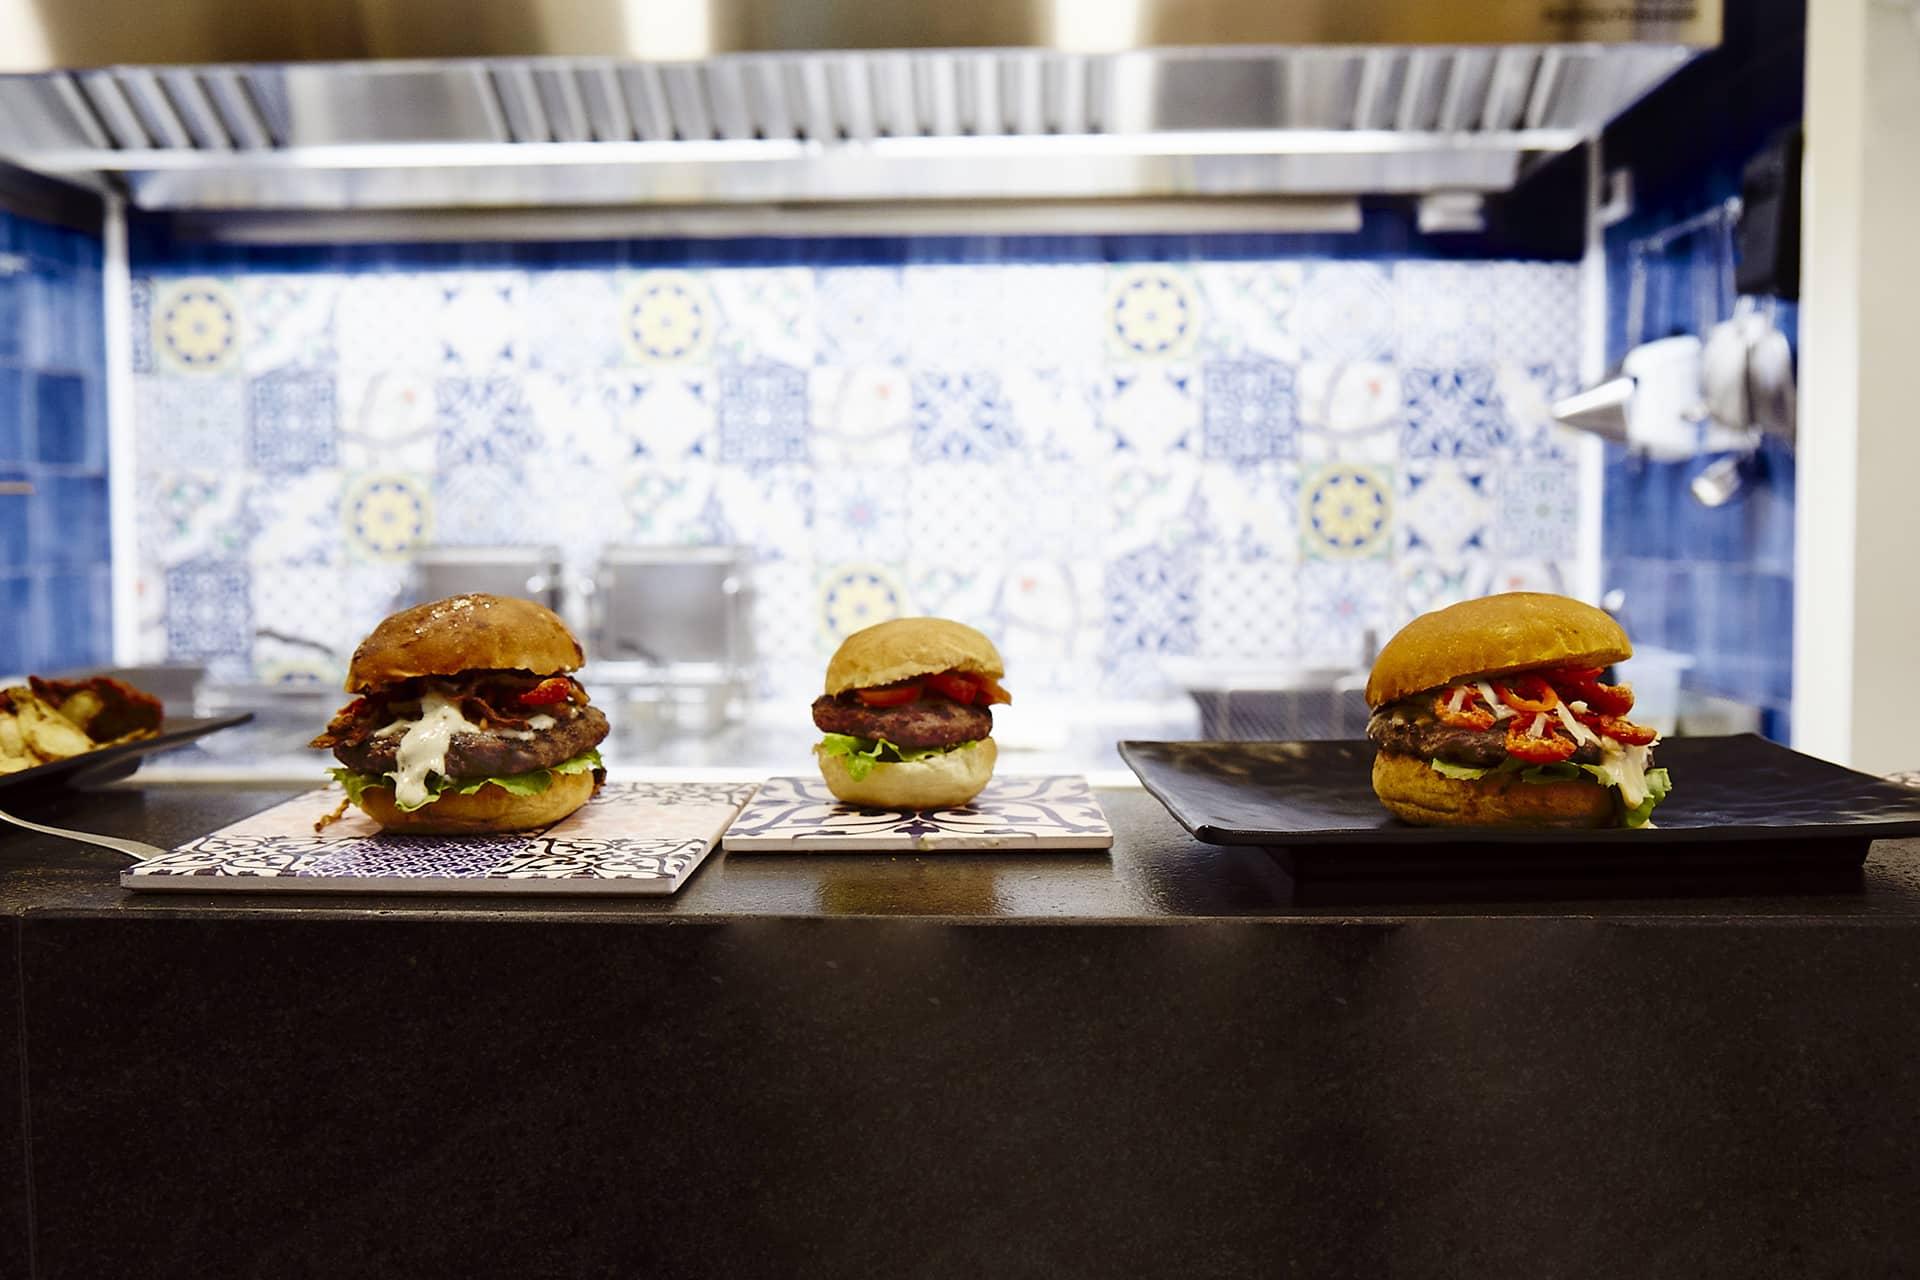 dalla vucciria + burger bimbi + abbrucia